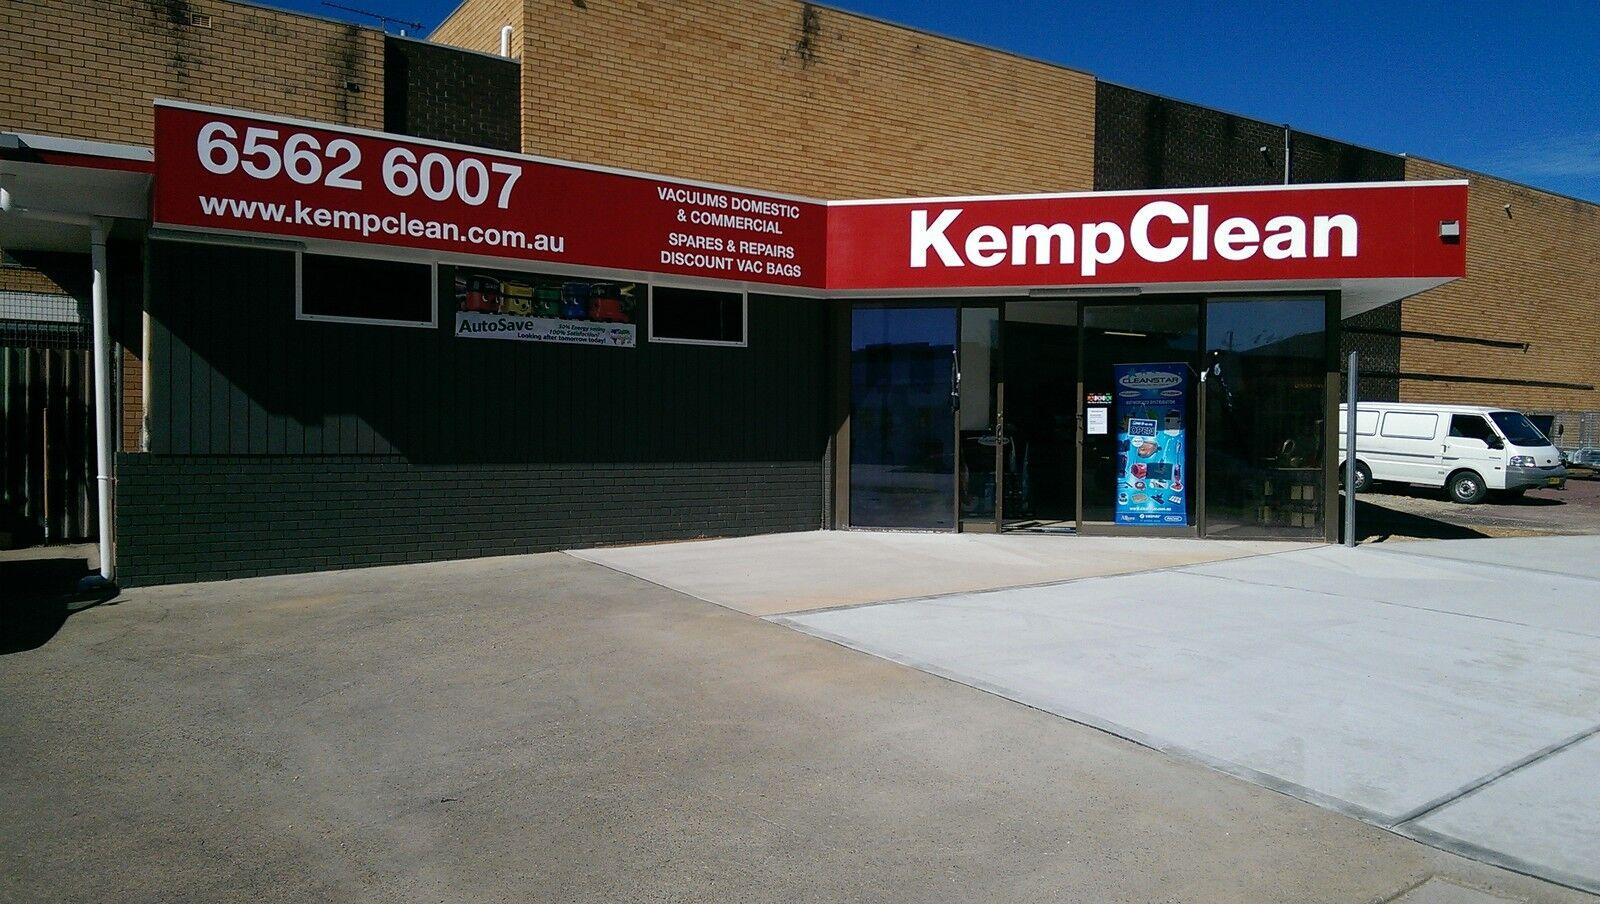 kempclean